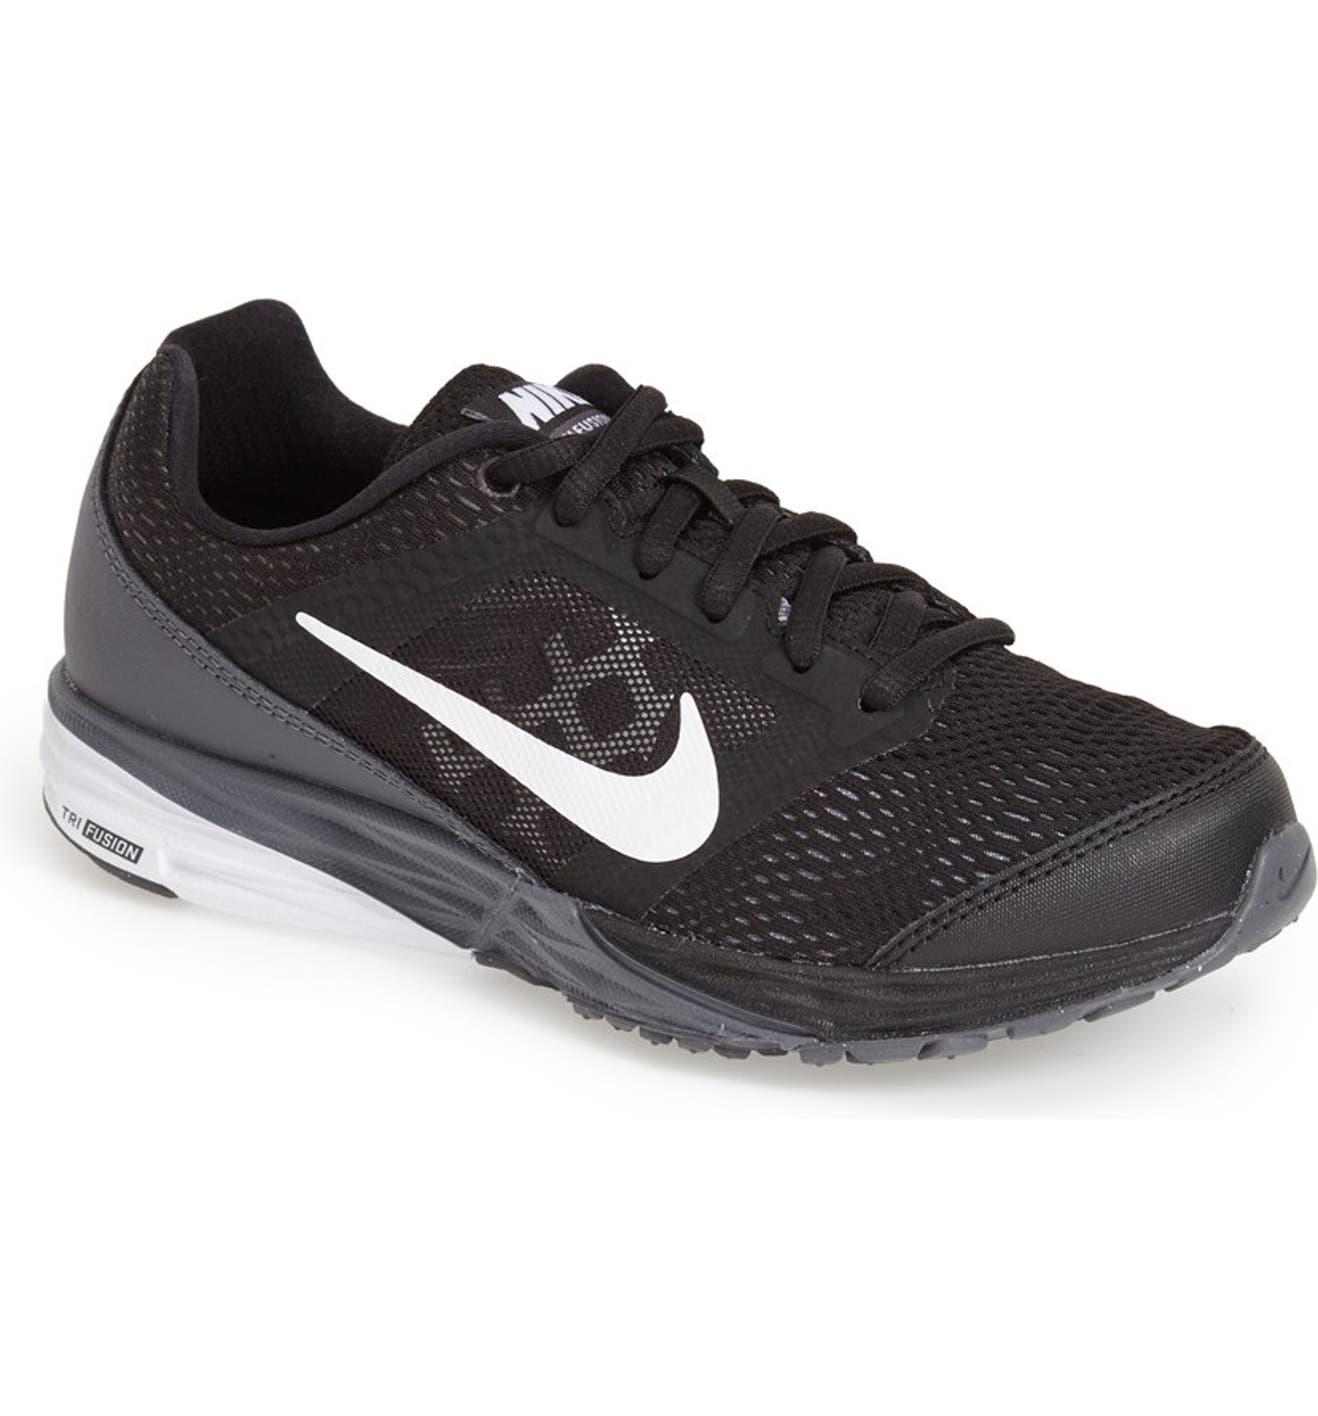 551882a07d0f Nike  Tri Fusion  Running Shoe (Big Kid)